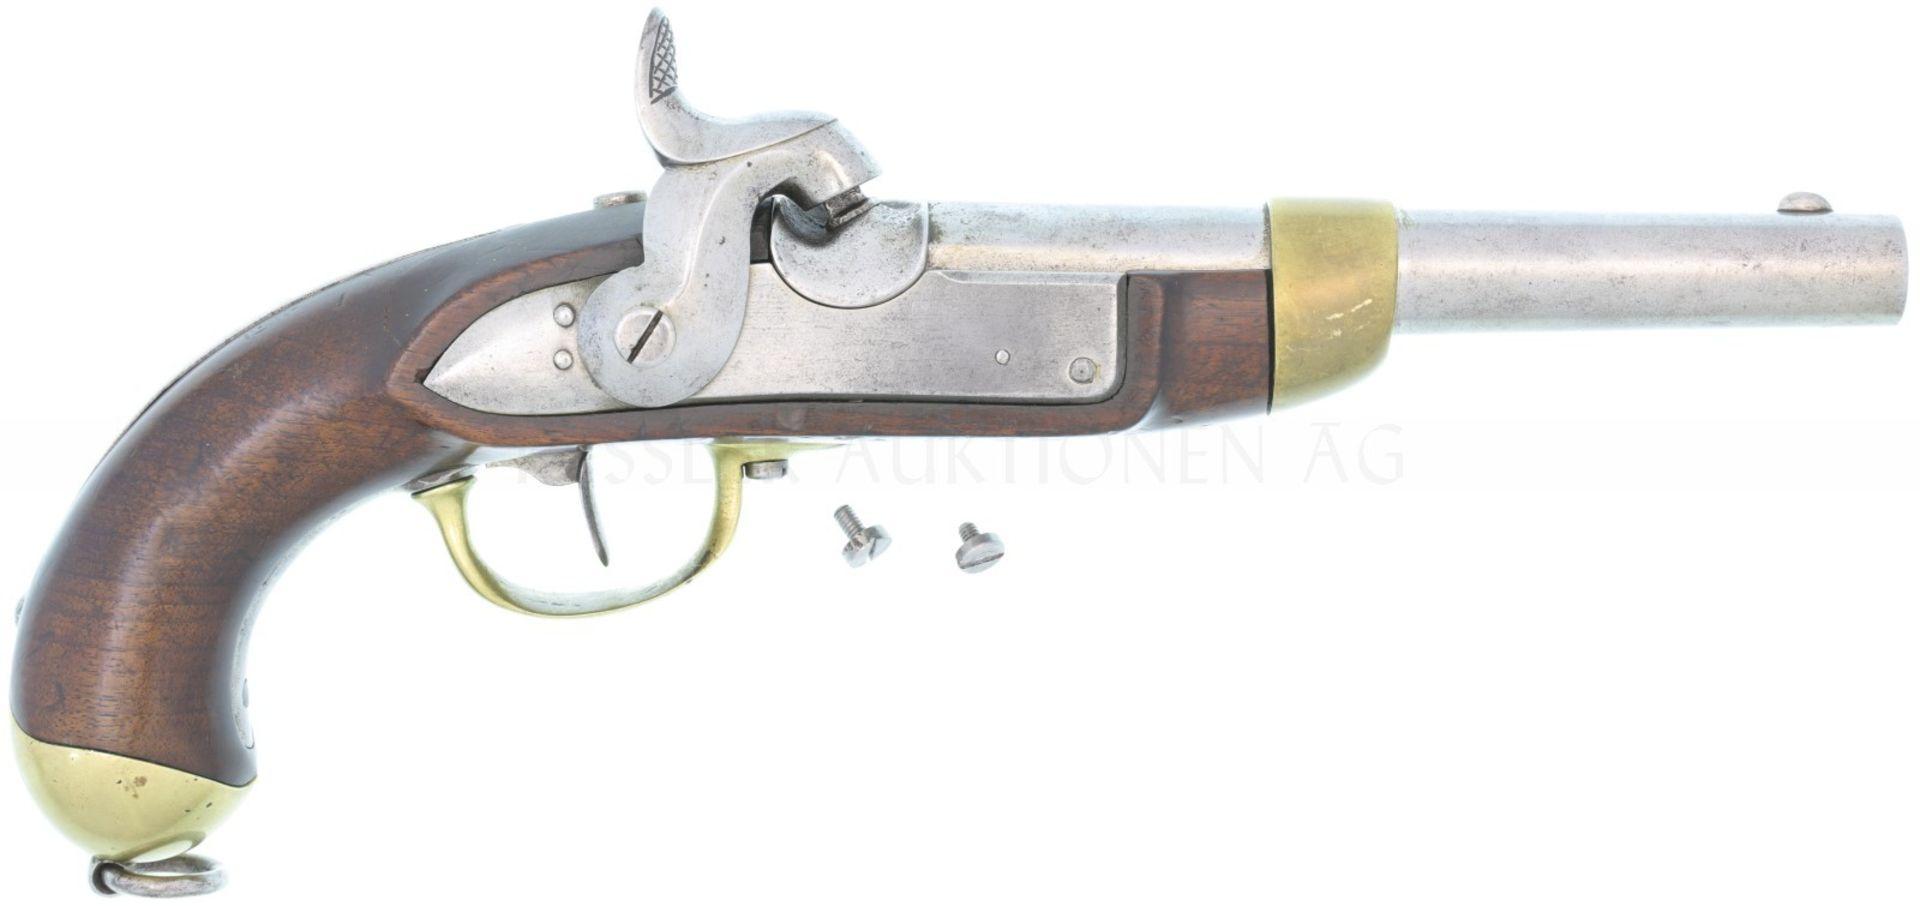 Perkussionspistole, Eidg. Ord. 1842, Kal. 17.6mm